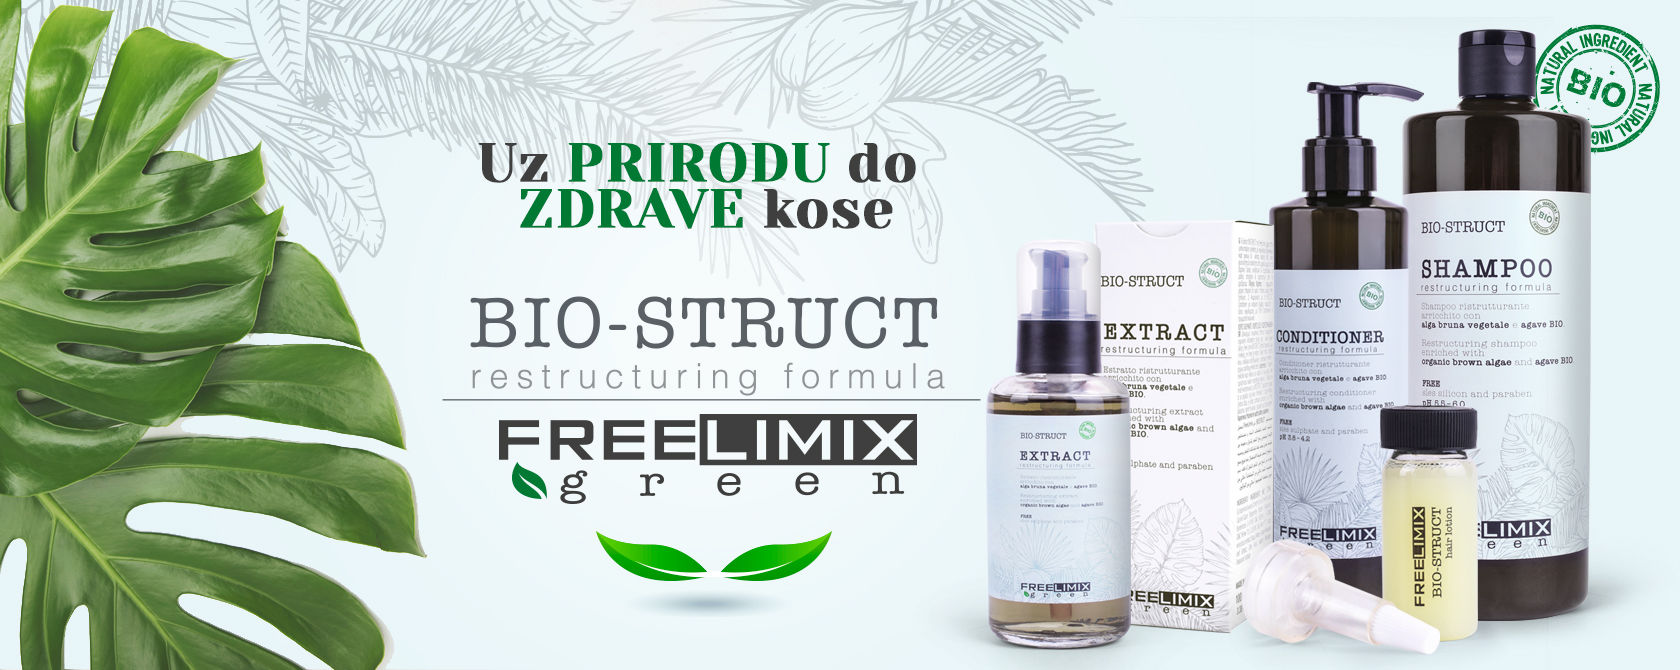 x Bio Struct Free Limix green